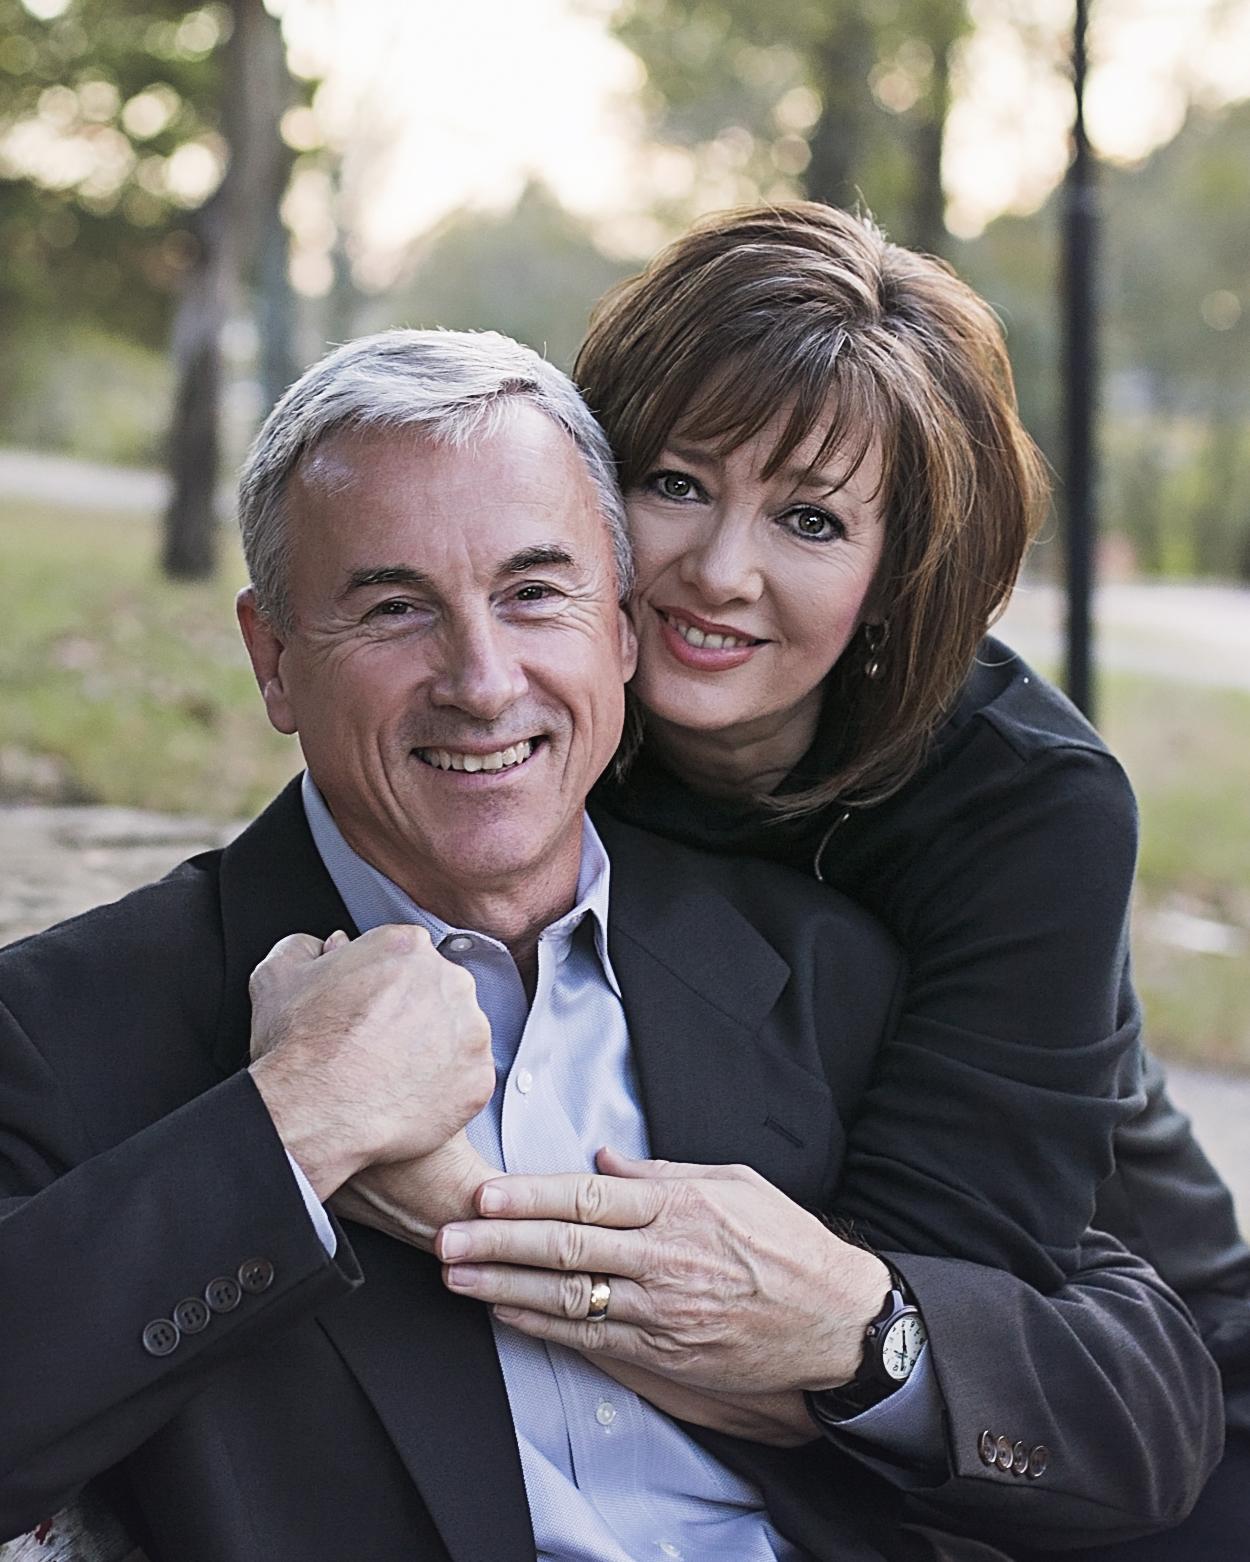 Leroy and Kimberly Wagner